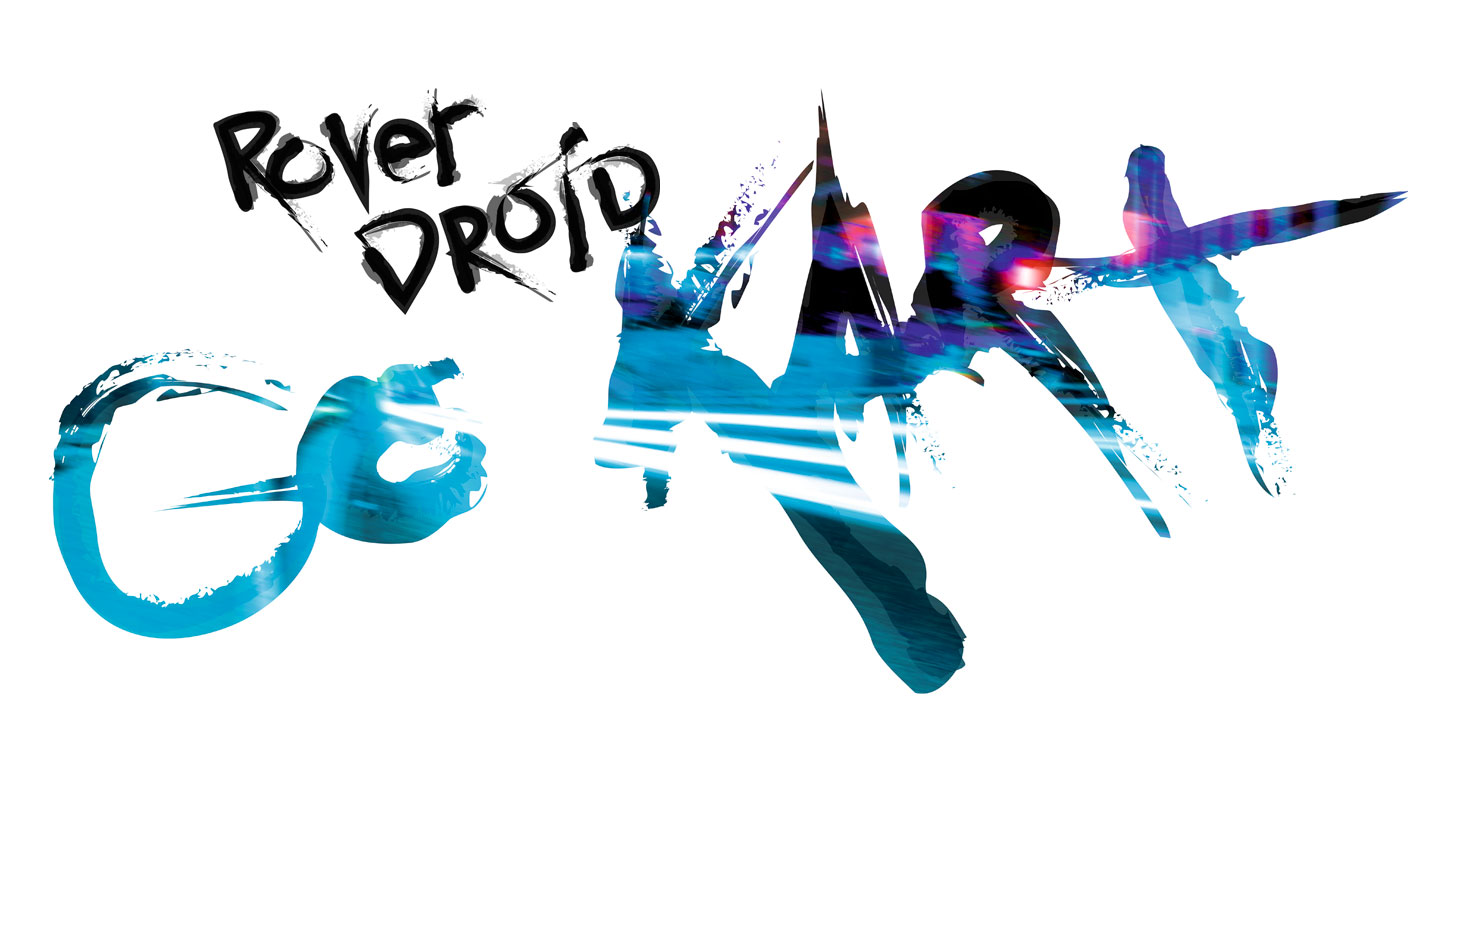 rover-droid-gokart